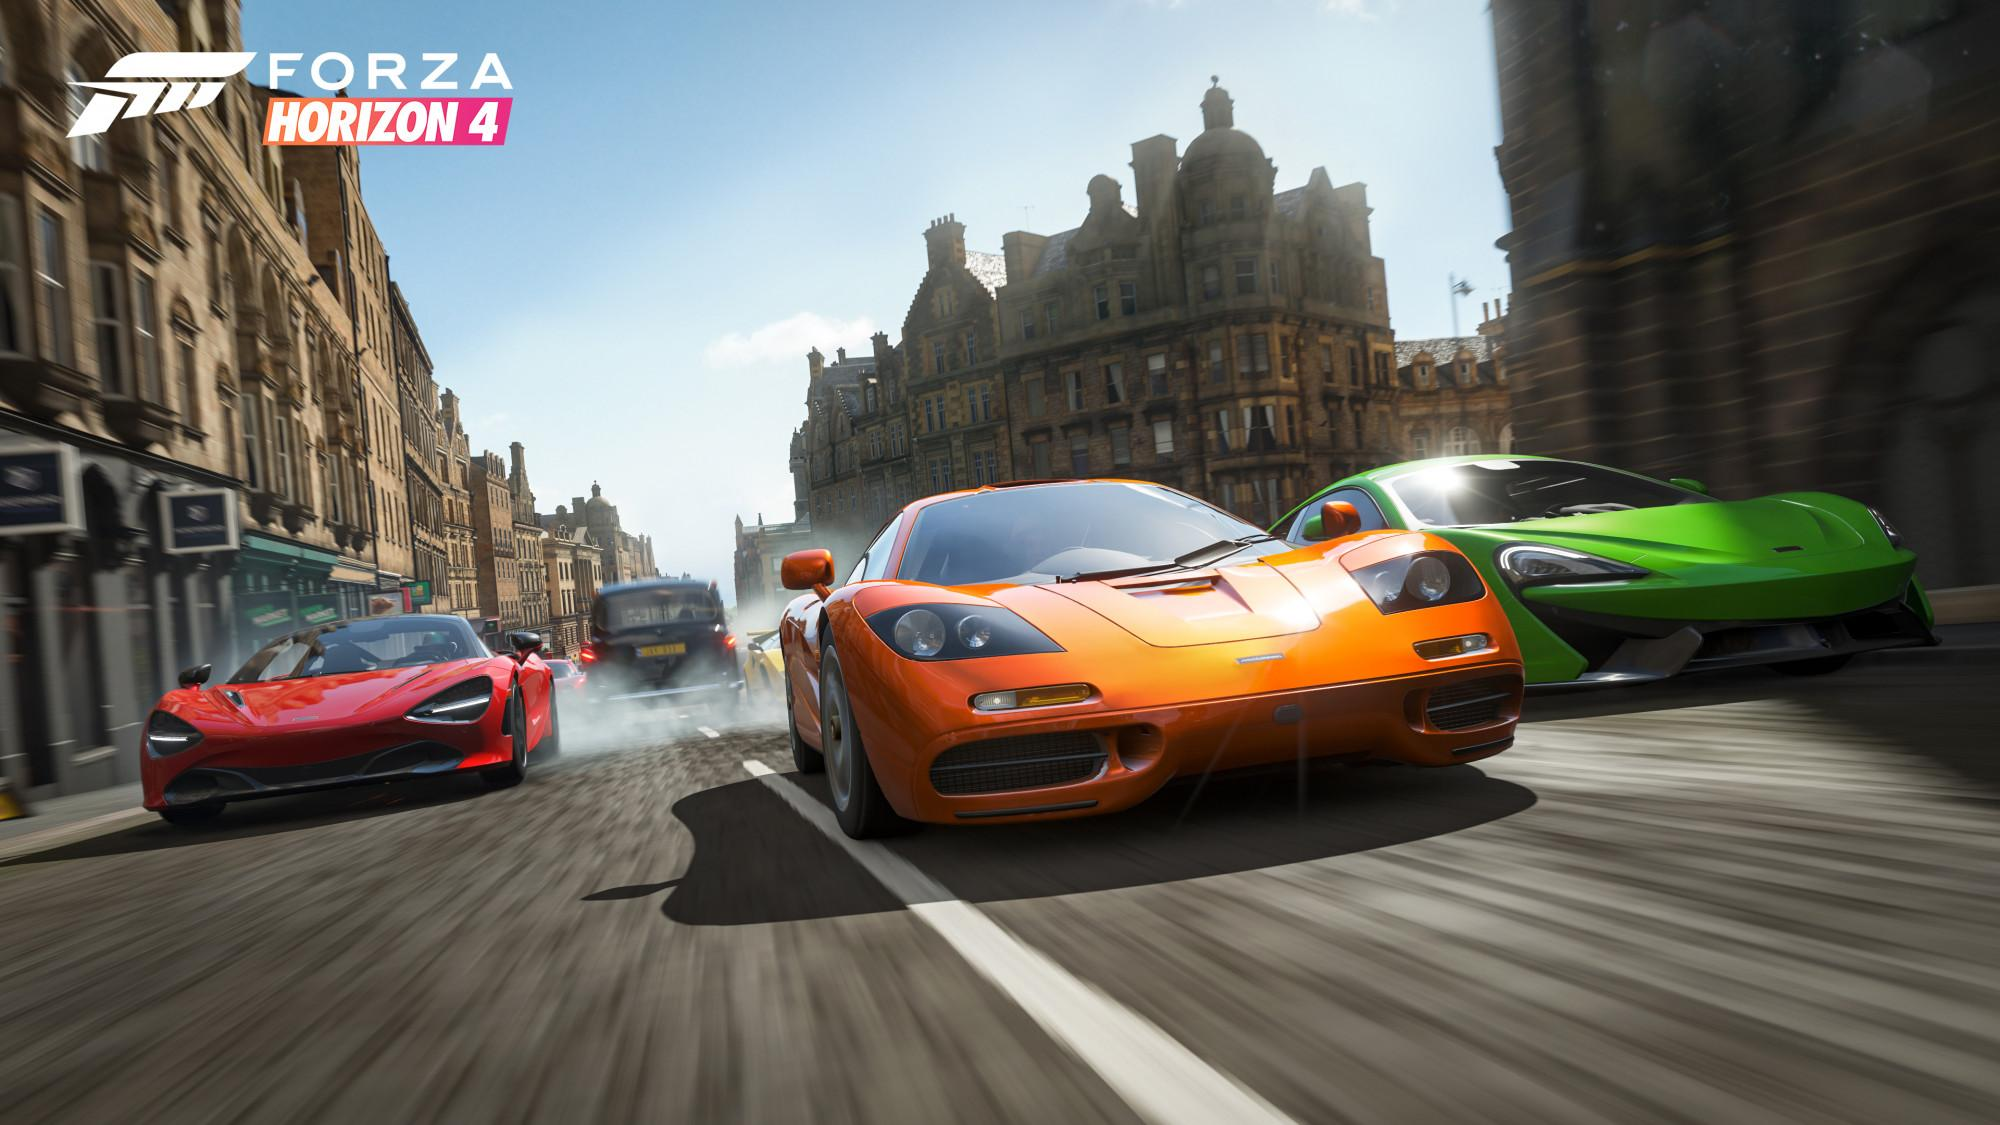 Forza Horizon 4 - PC